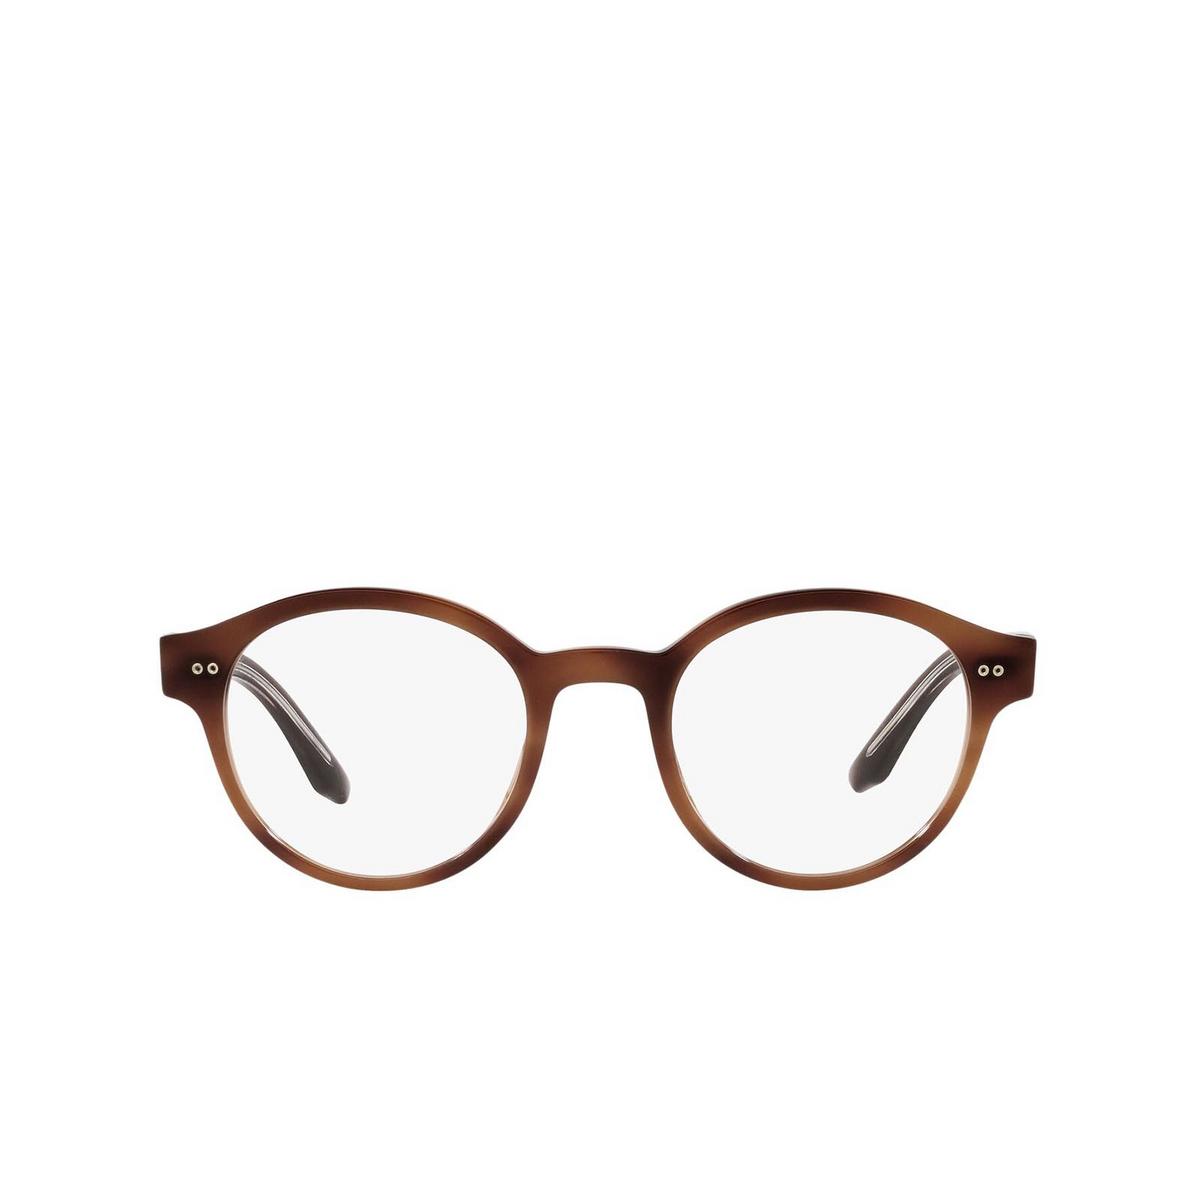 Giorgio Armani® Round Eyeglasses: AR7196 color Striped Brown 5573 - front view.